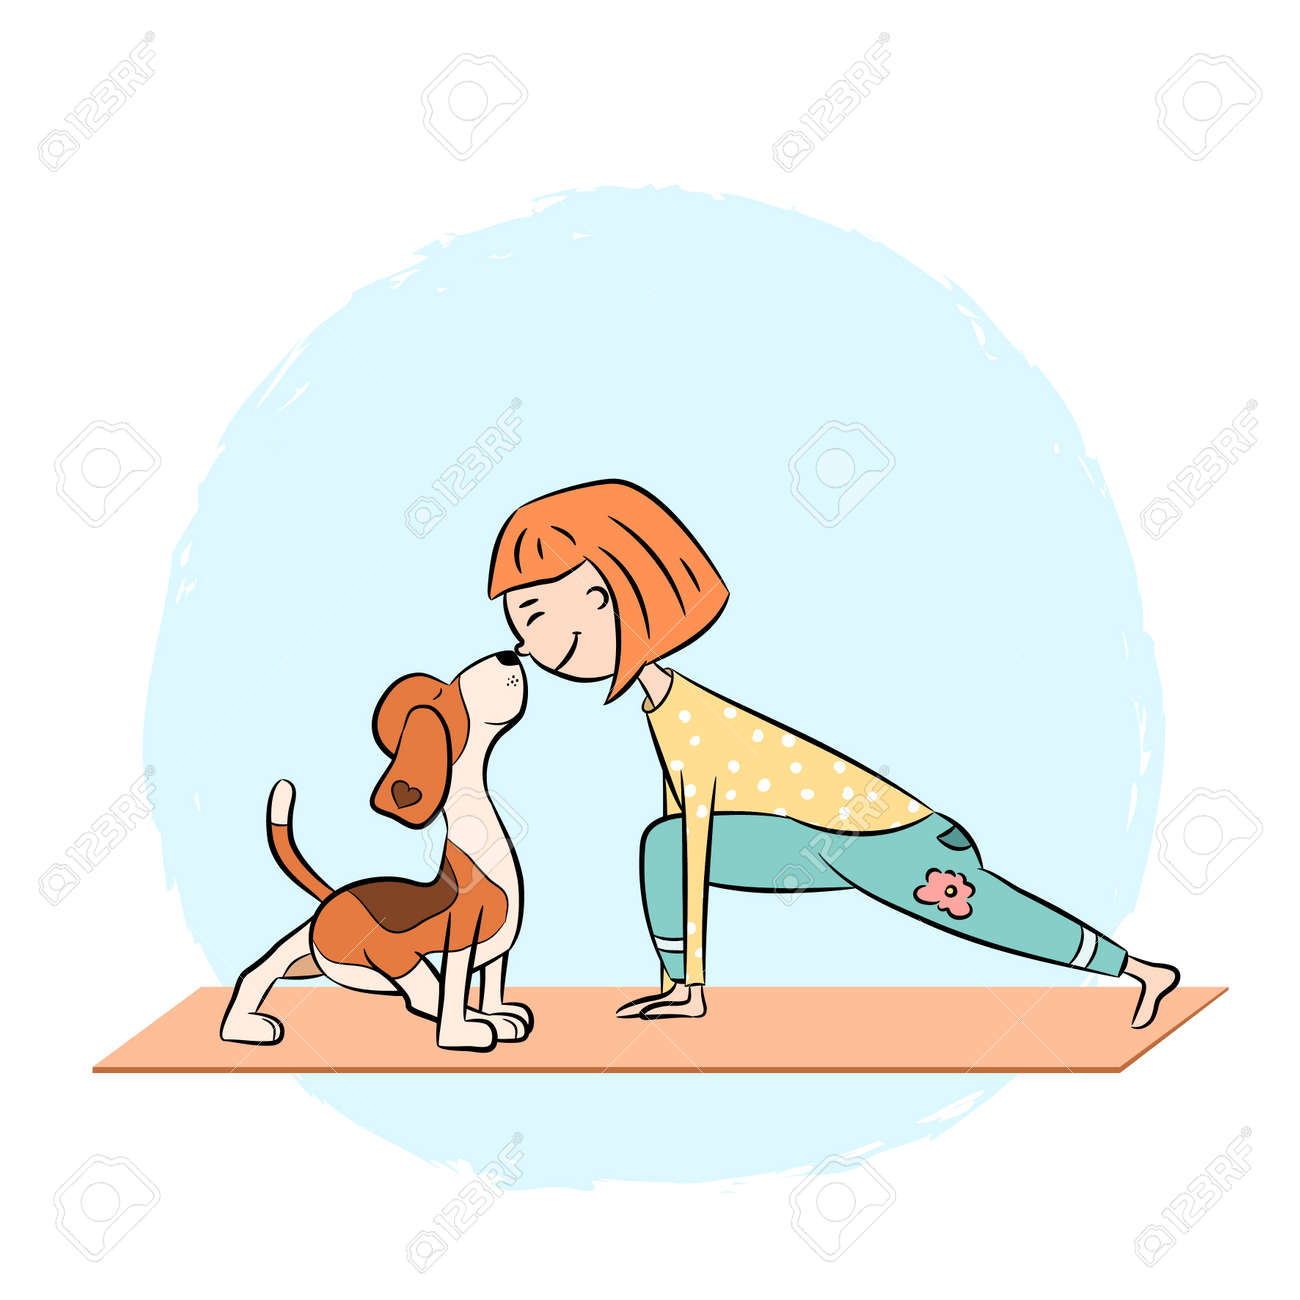 Cartoon Funny Dog Beagle With Girl Doing Yoga Pose Surya Namaskara Royalty Free Cliparts Vectors And Stock Illustration Image 108845343